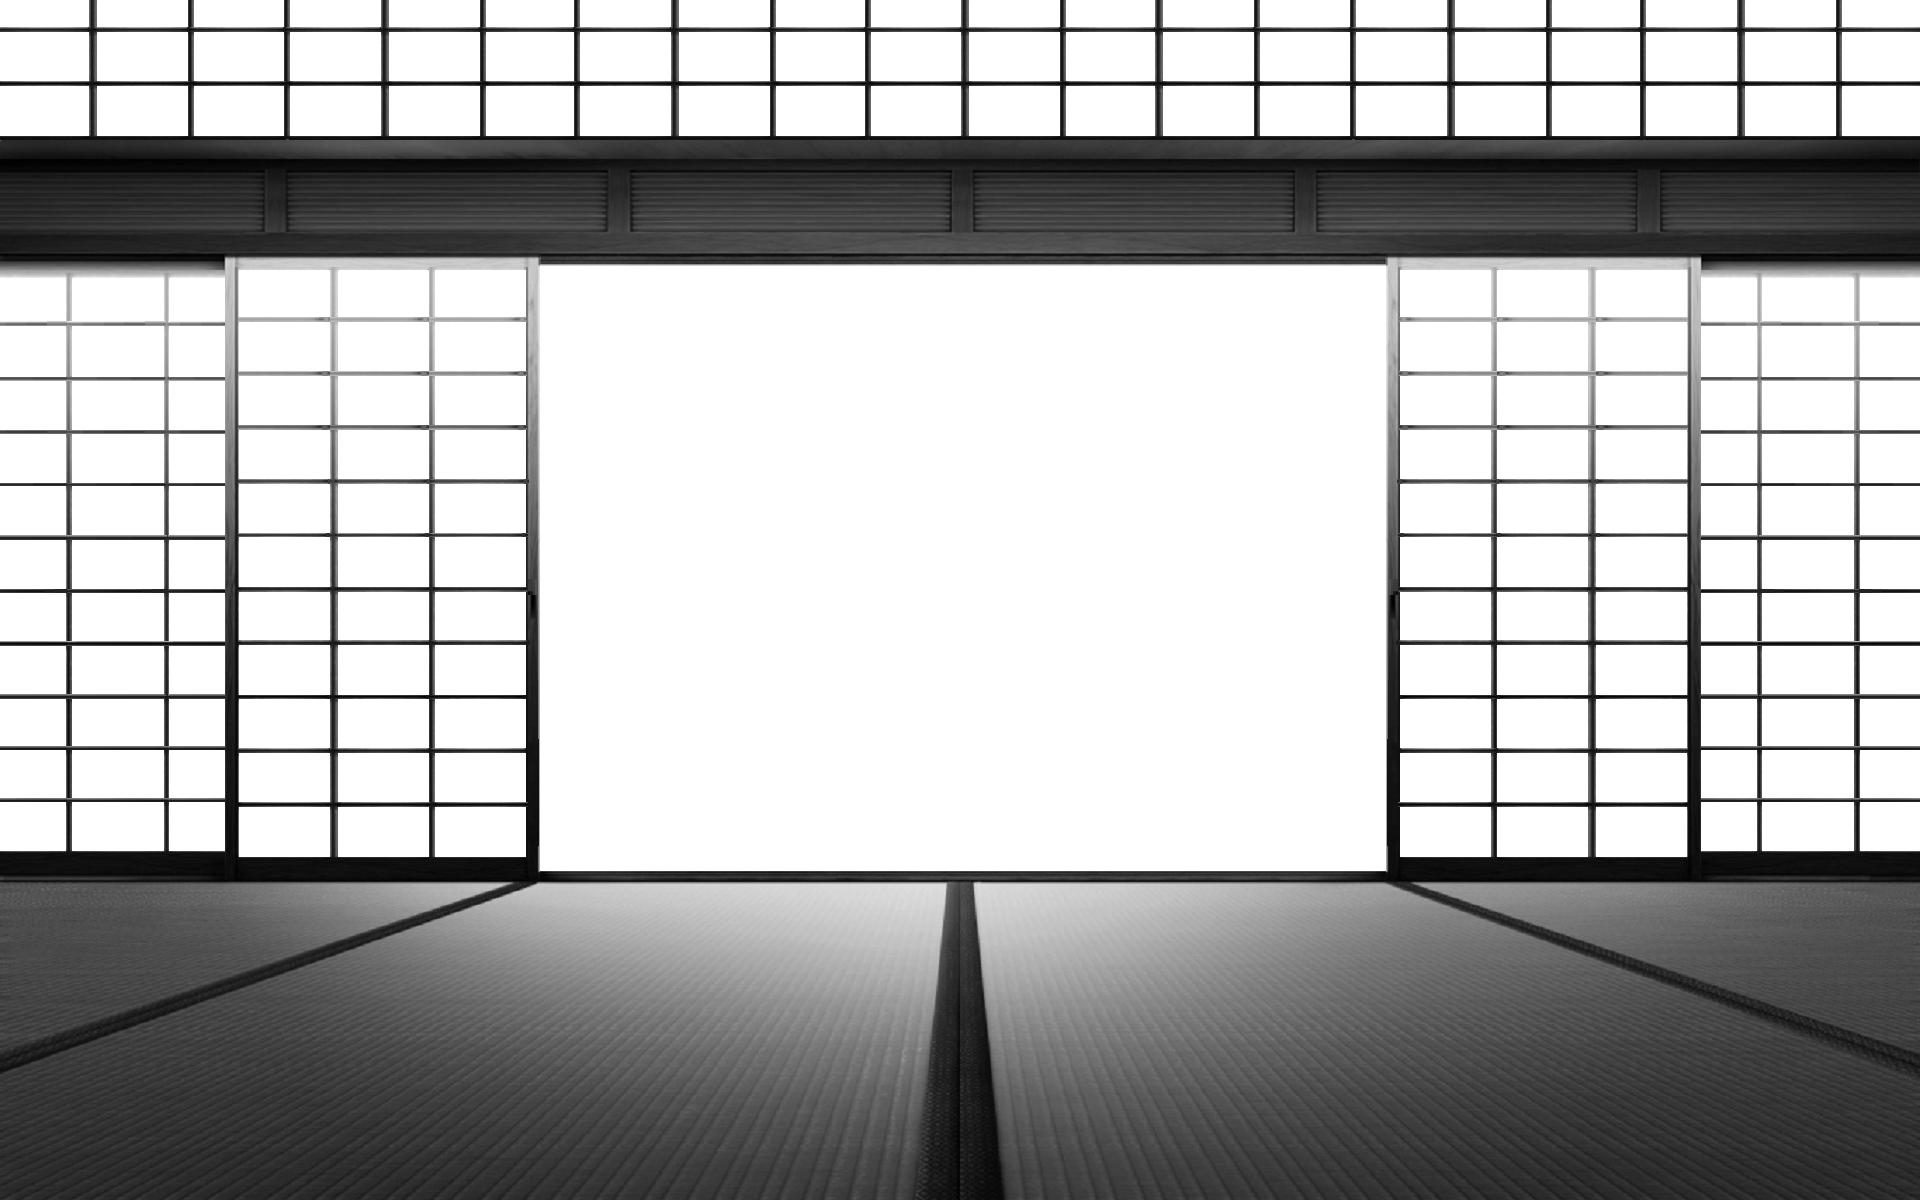 www.dna-et.com-dojo-simulated-high-construct-edit